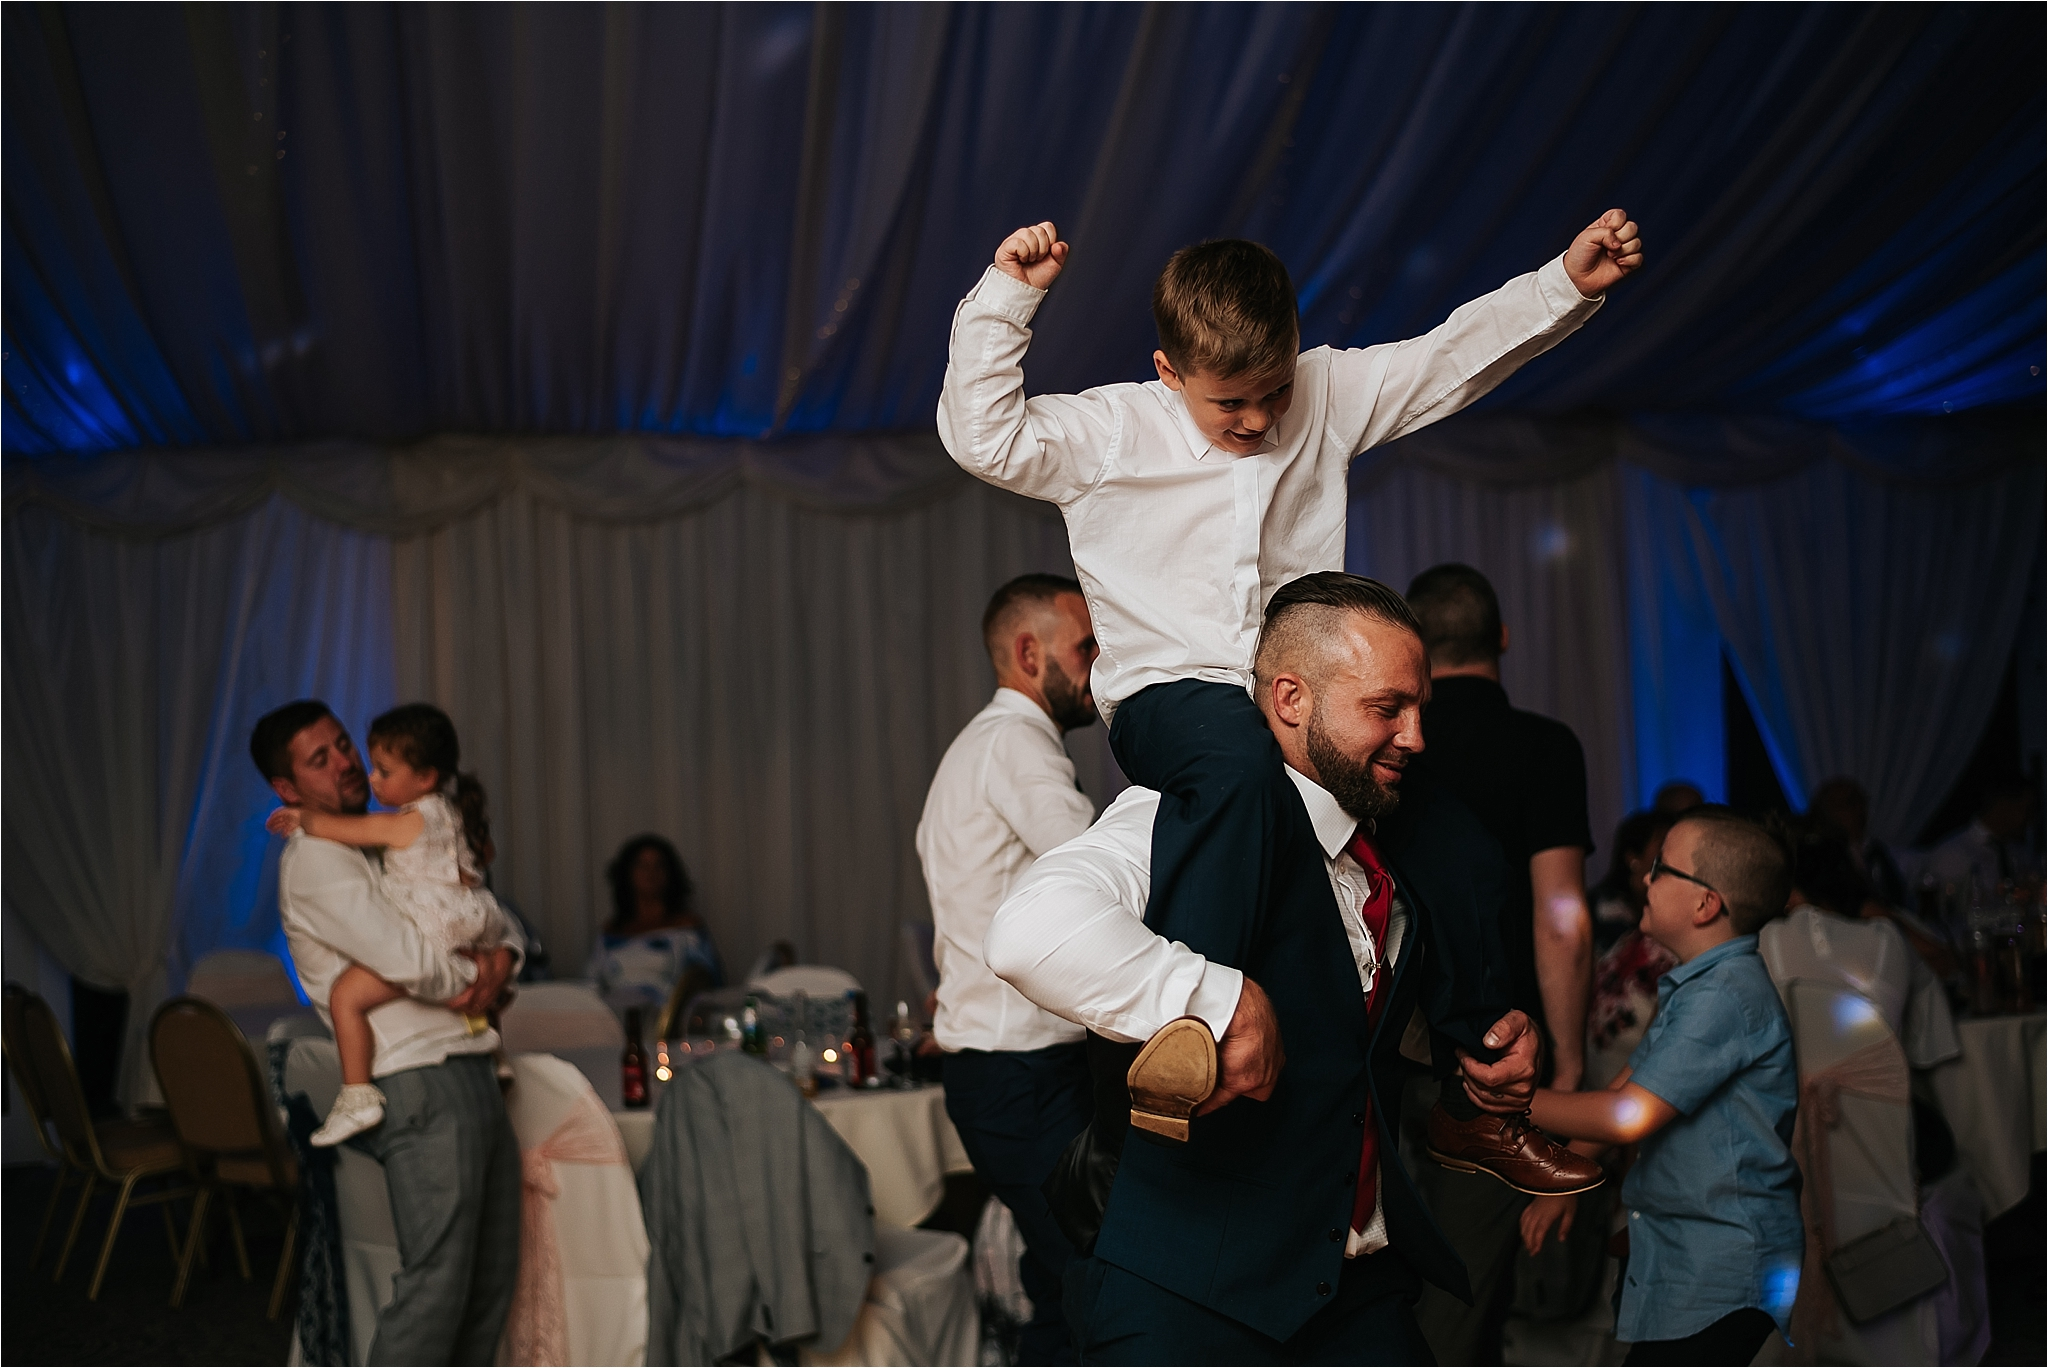 thevilla+lancashire+wreagreen+wedding+photographer119.jpg